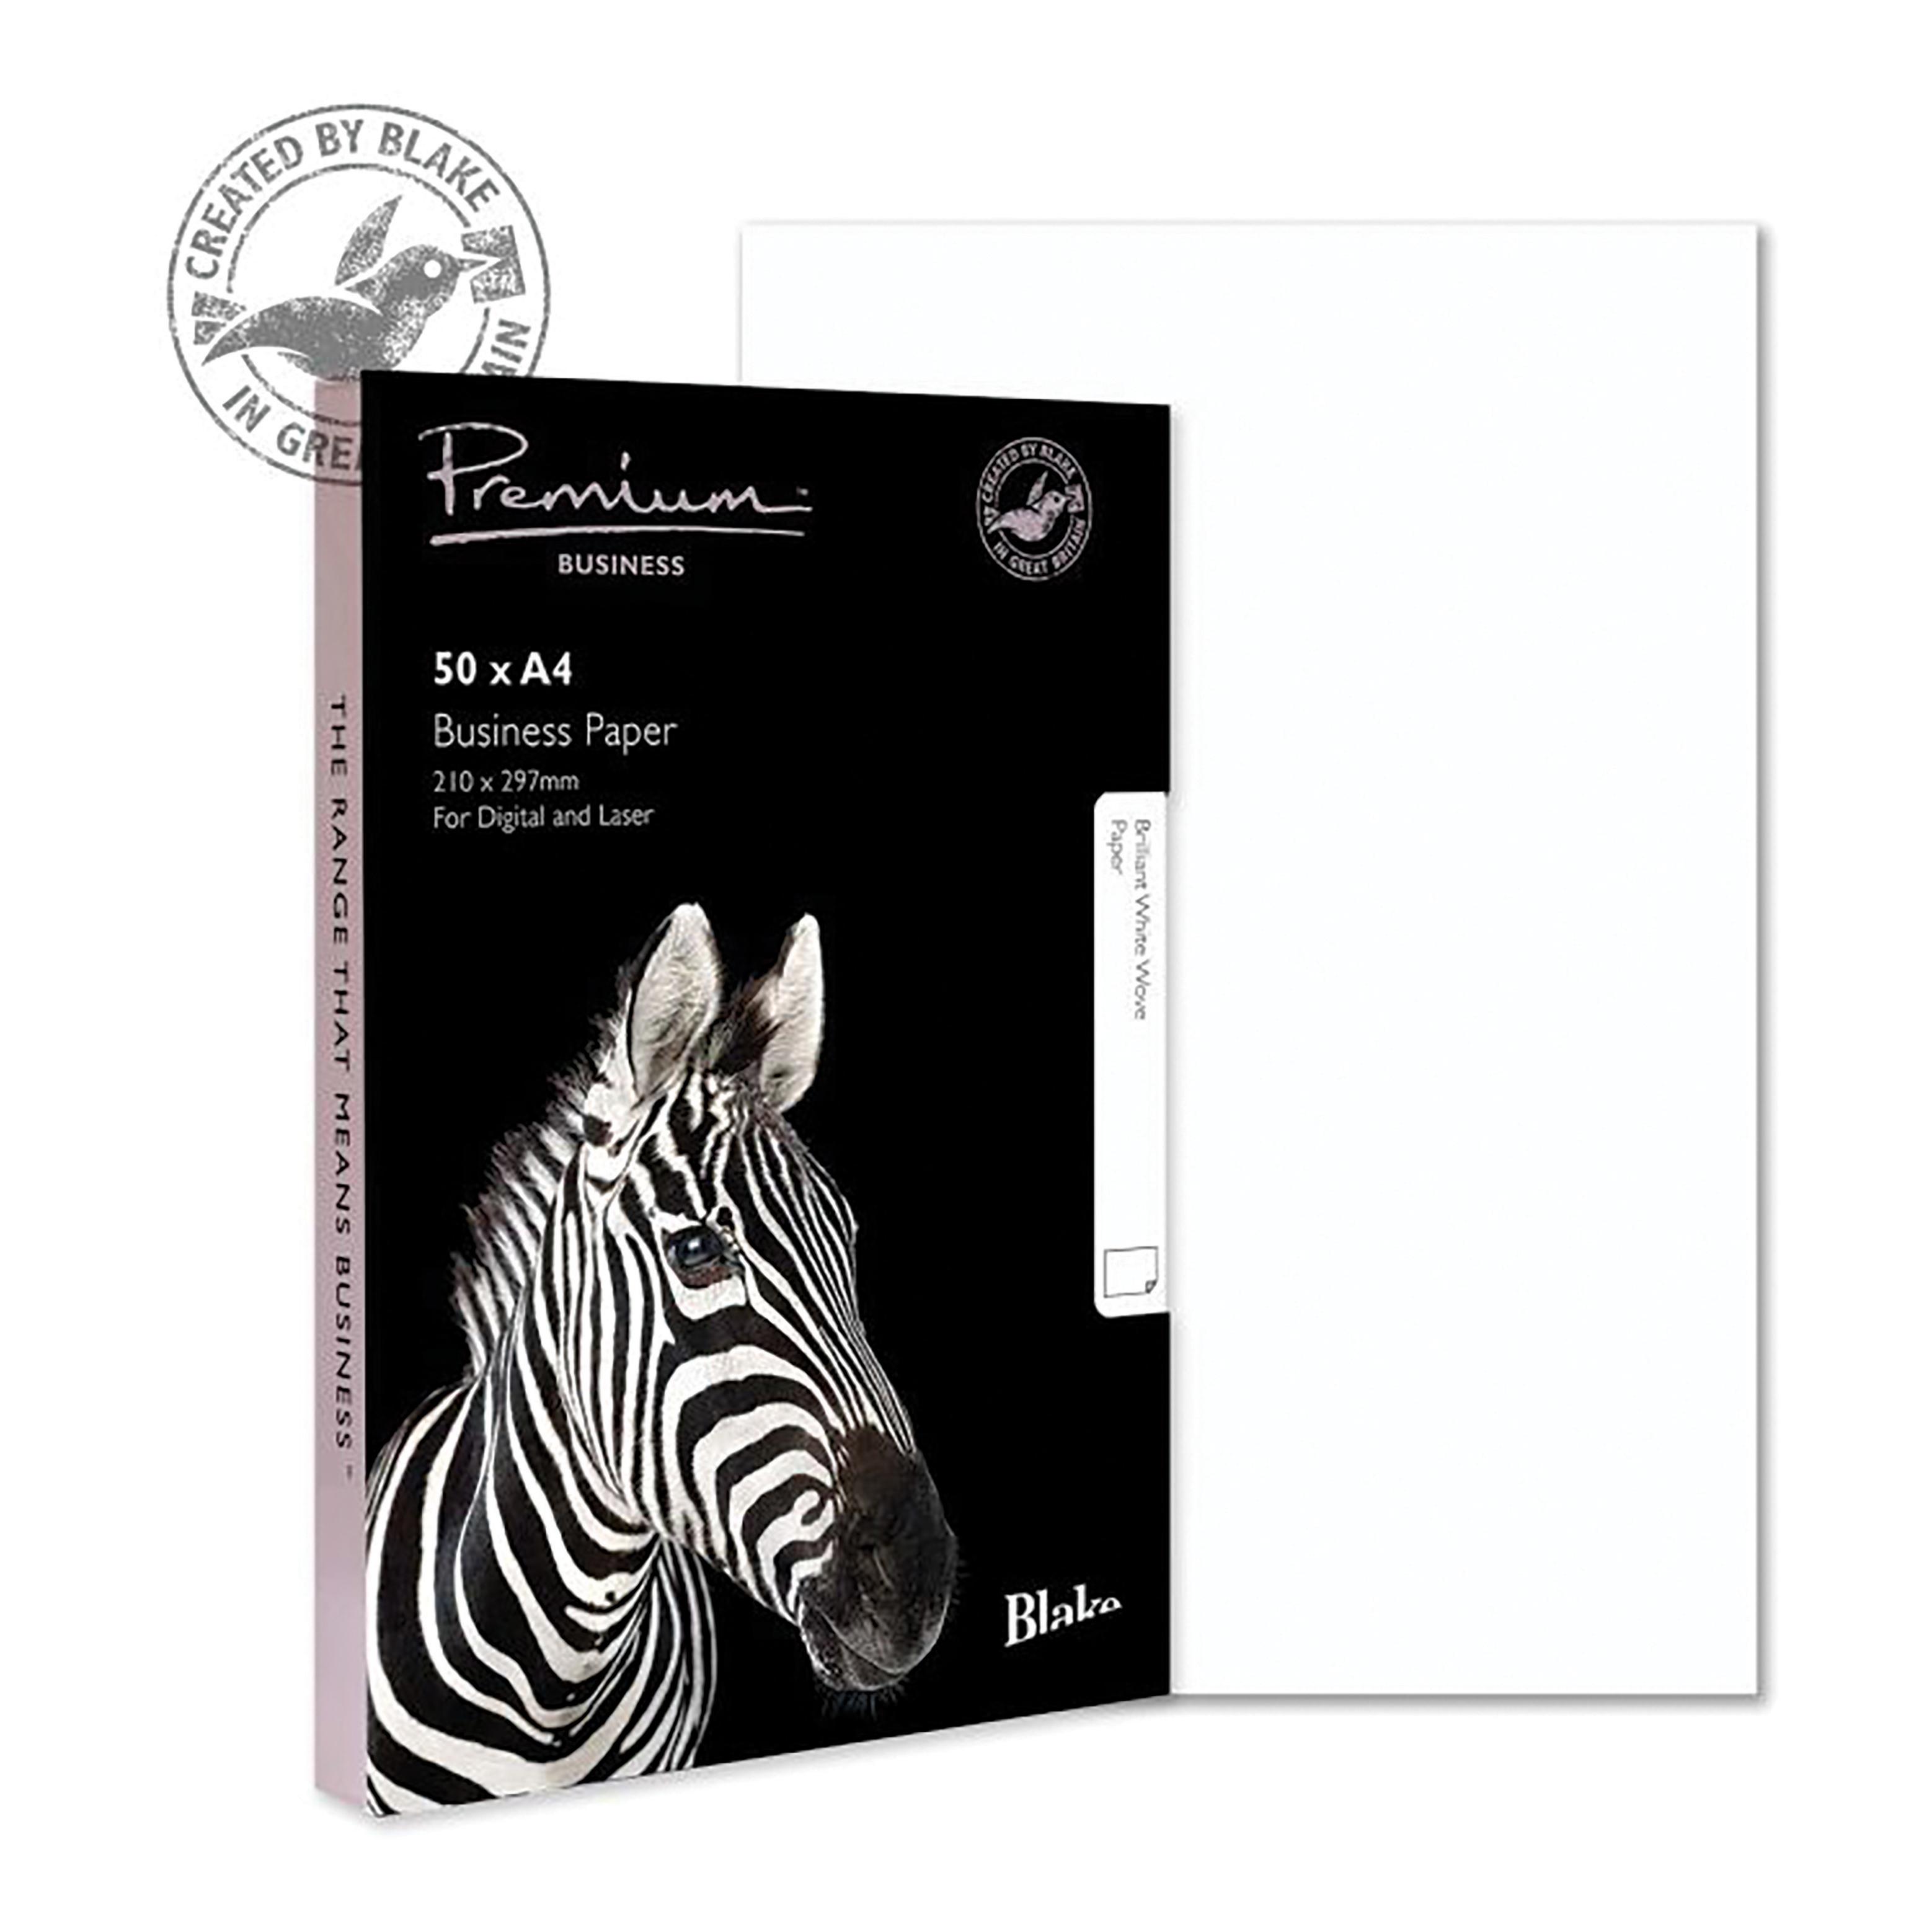 Blake Premium Business Paper 120gsm A4 Brilliant White Wove Finish [Pack 50] Ref 37676